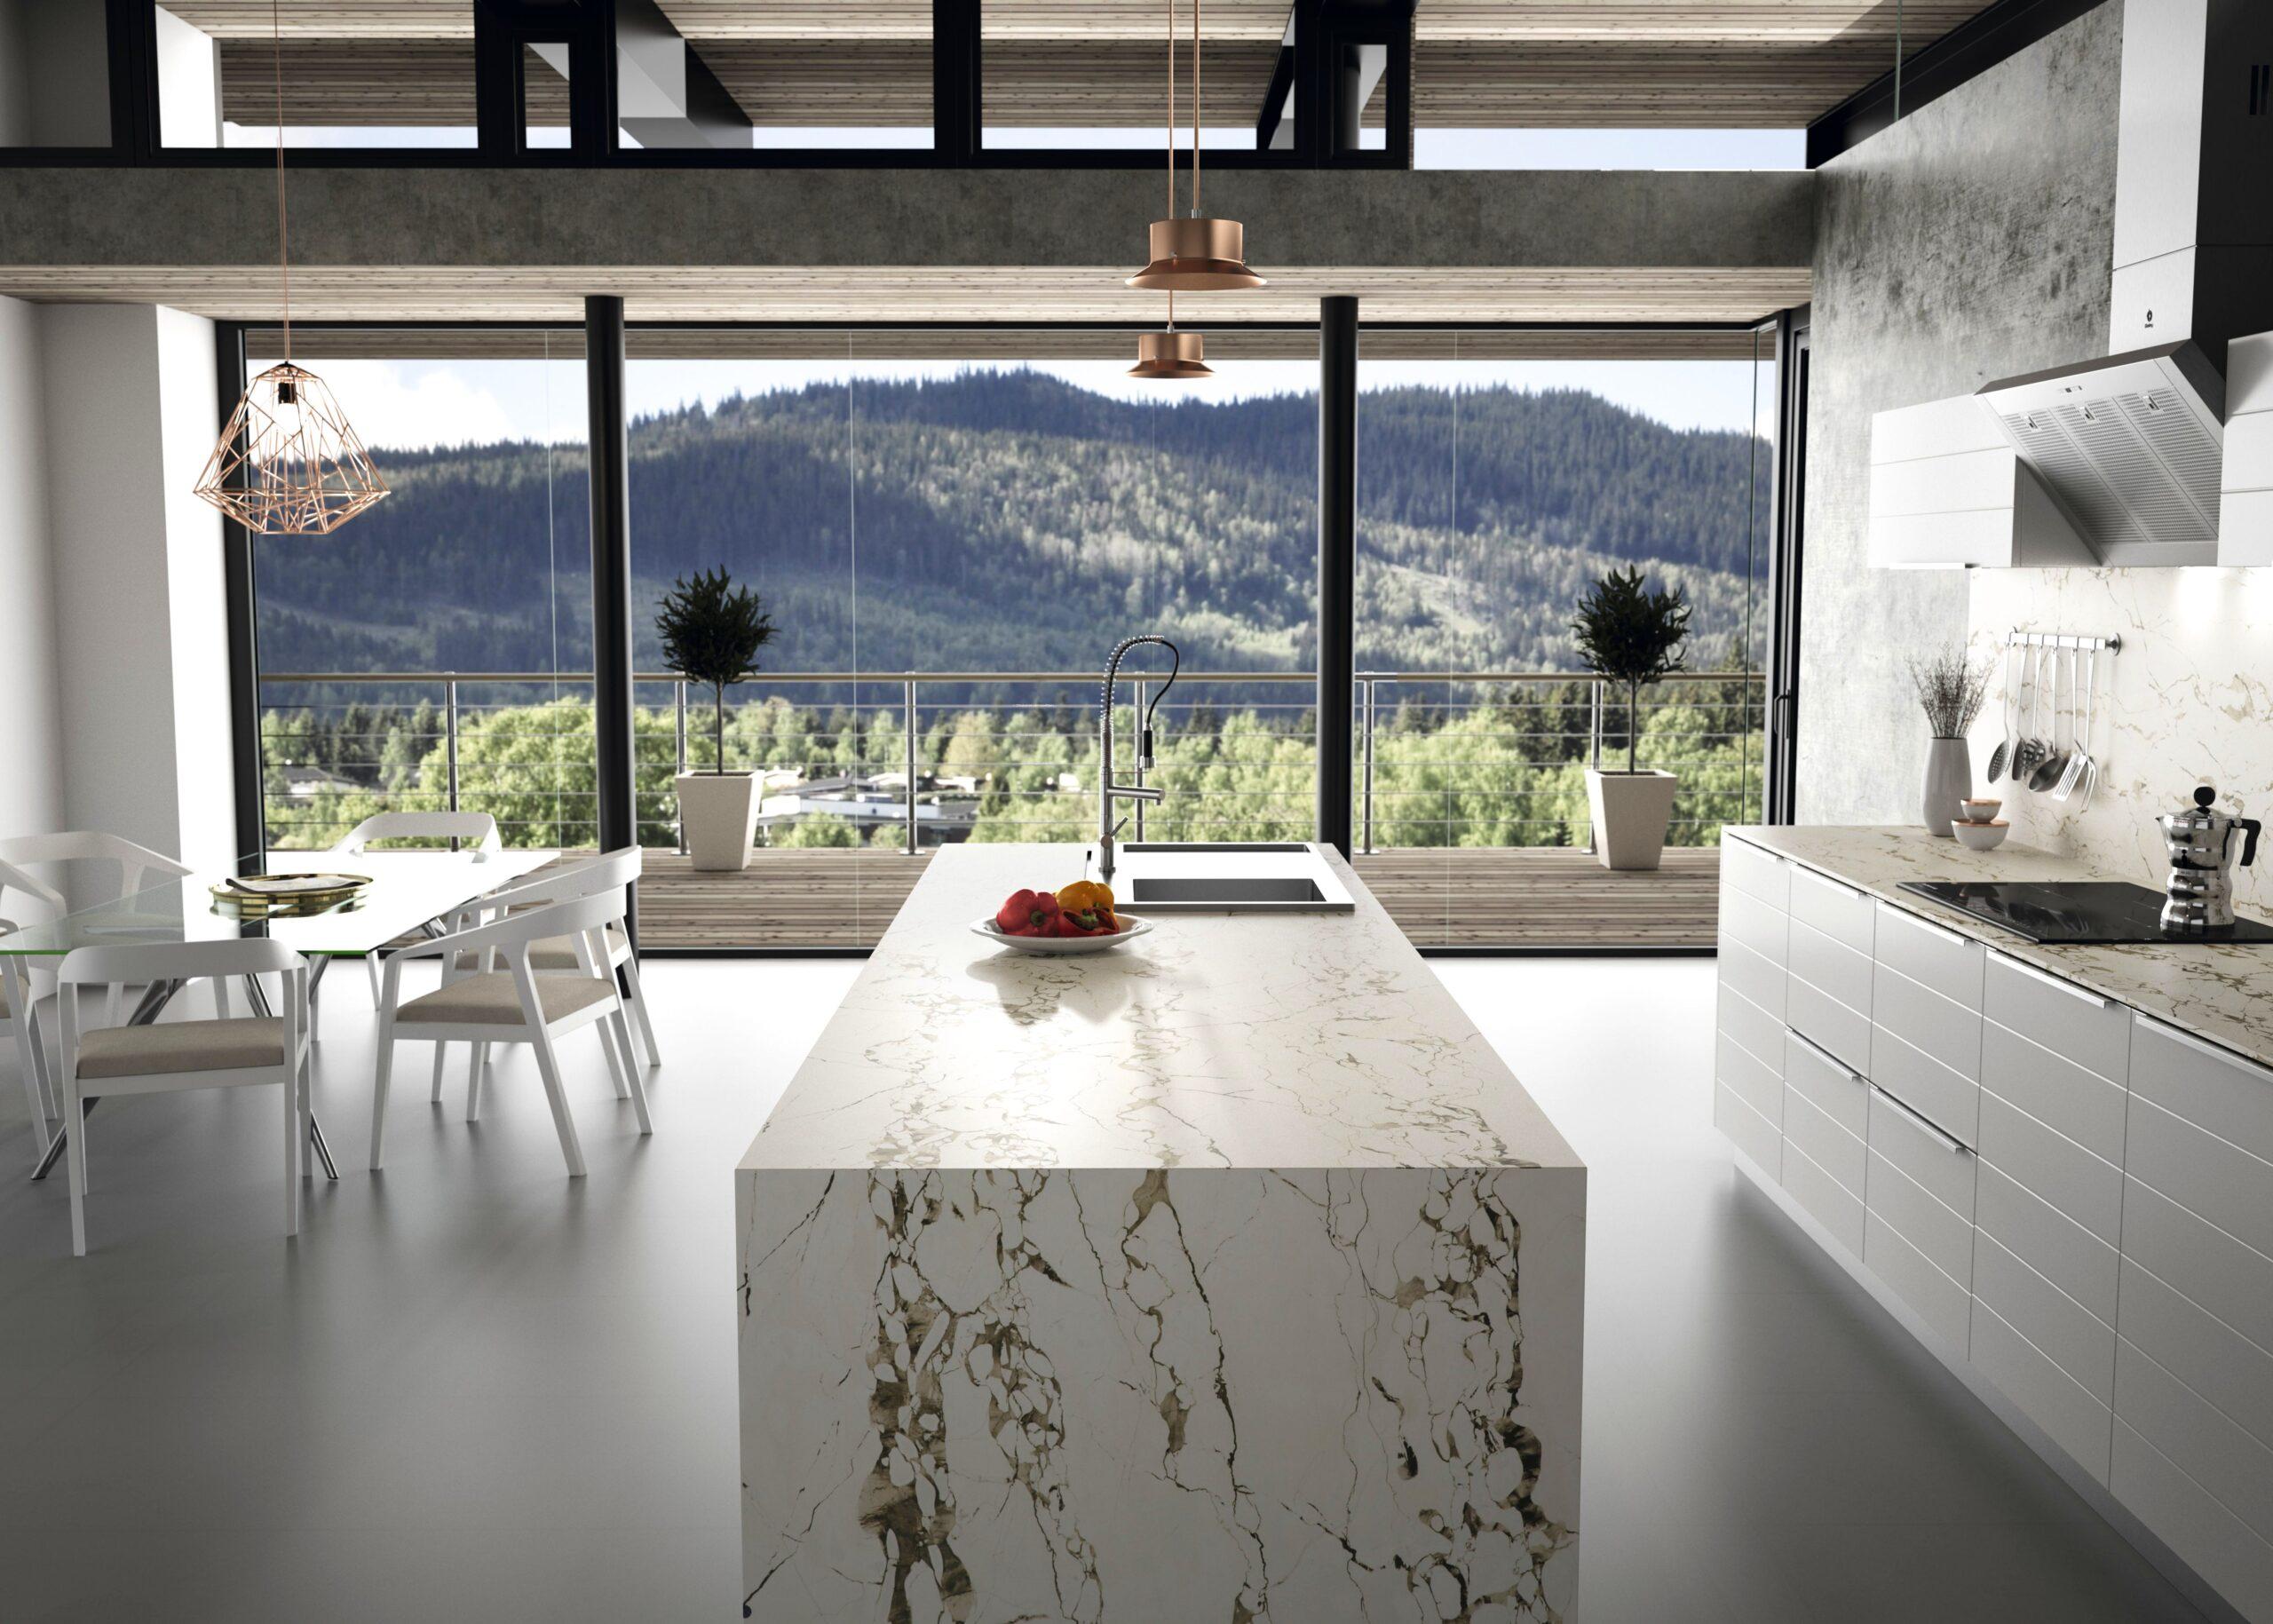 Image of Dekton Kitchen Bedrock 1 2 scaled in Design a professional kitchen - Cosentino